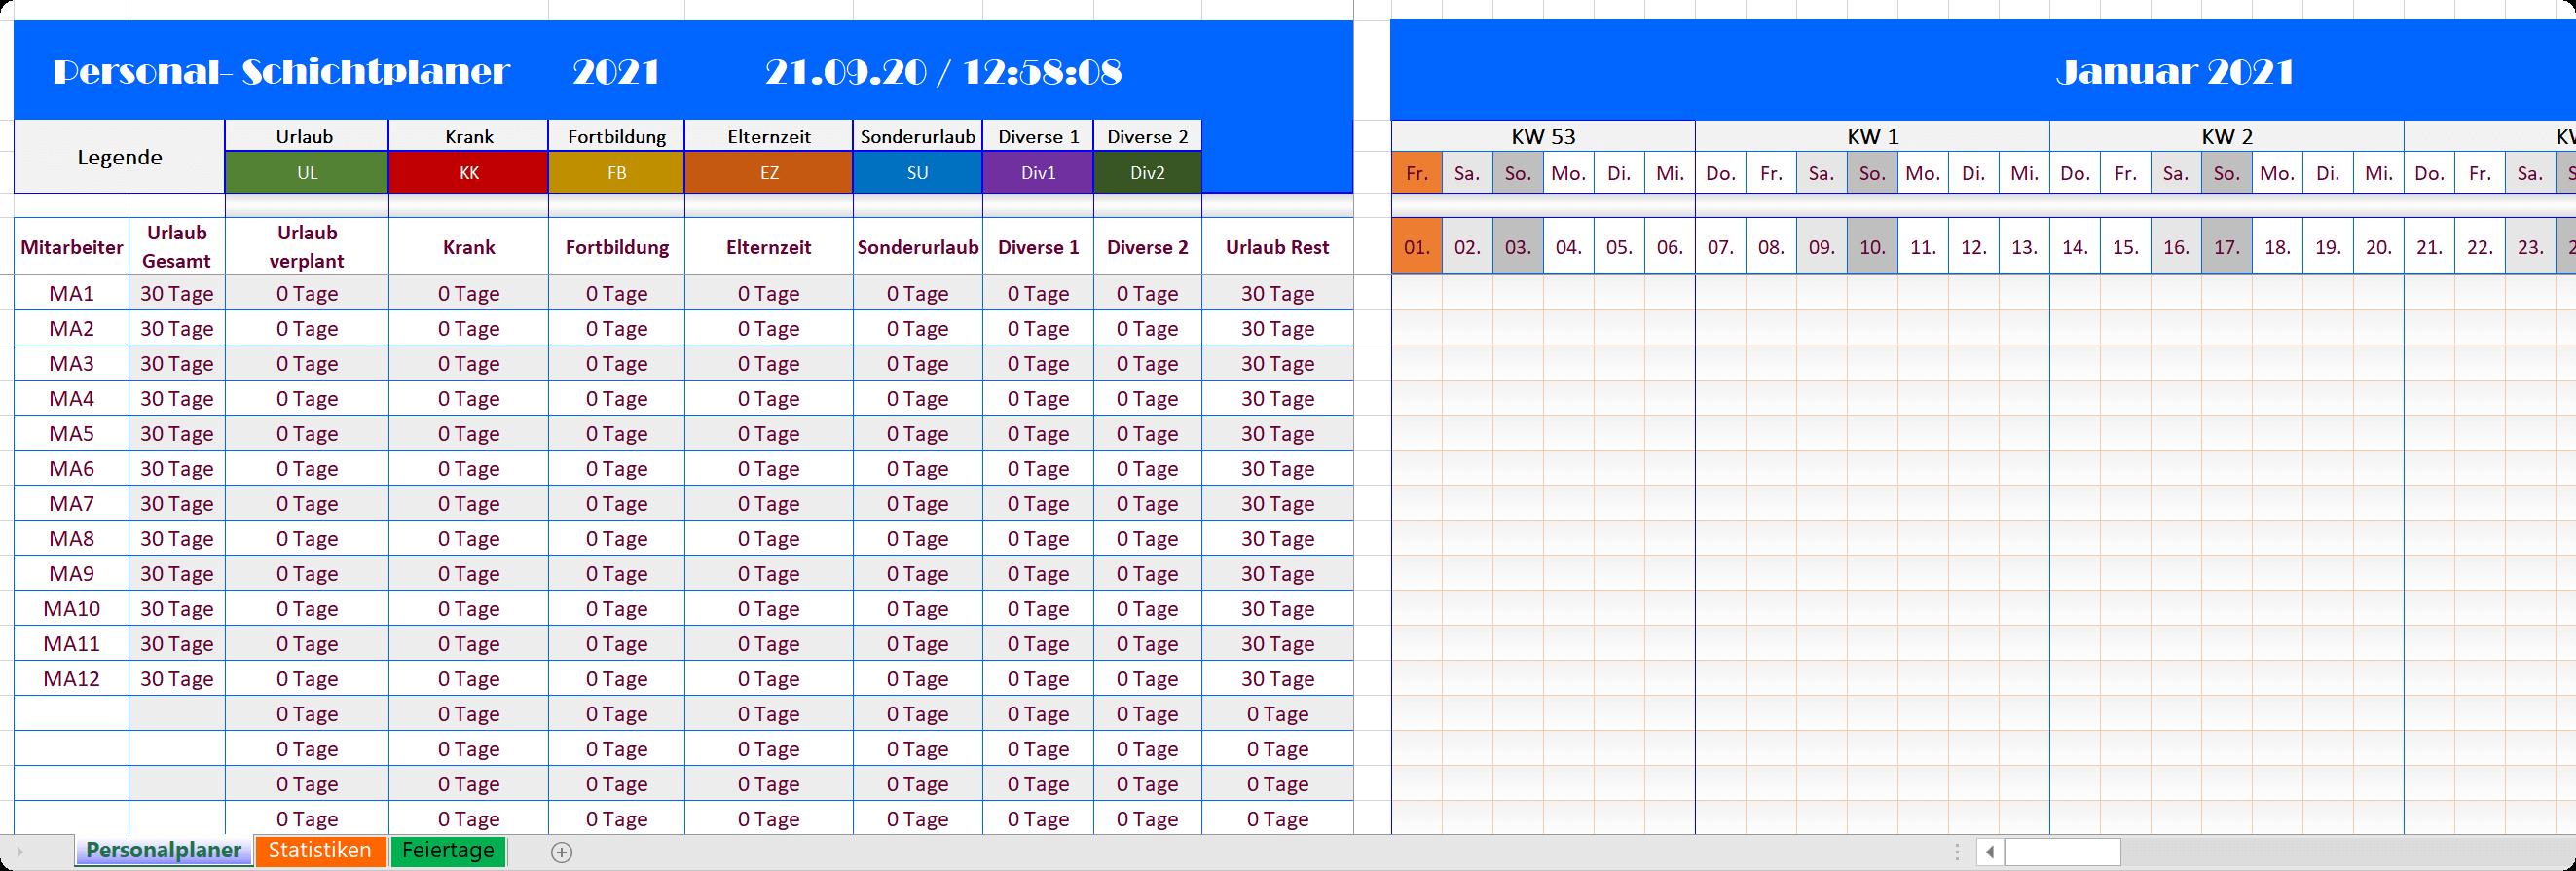 Excel Personalplaner 2021 - Blue